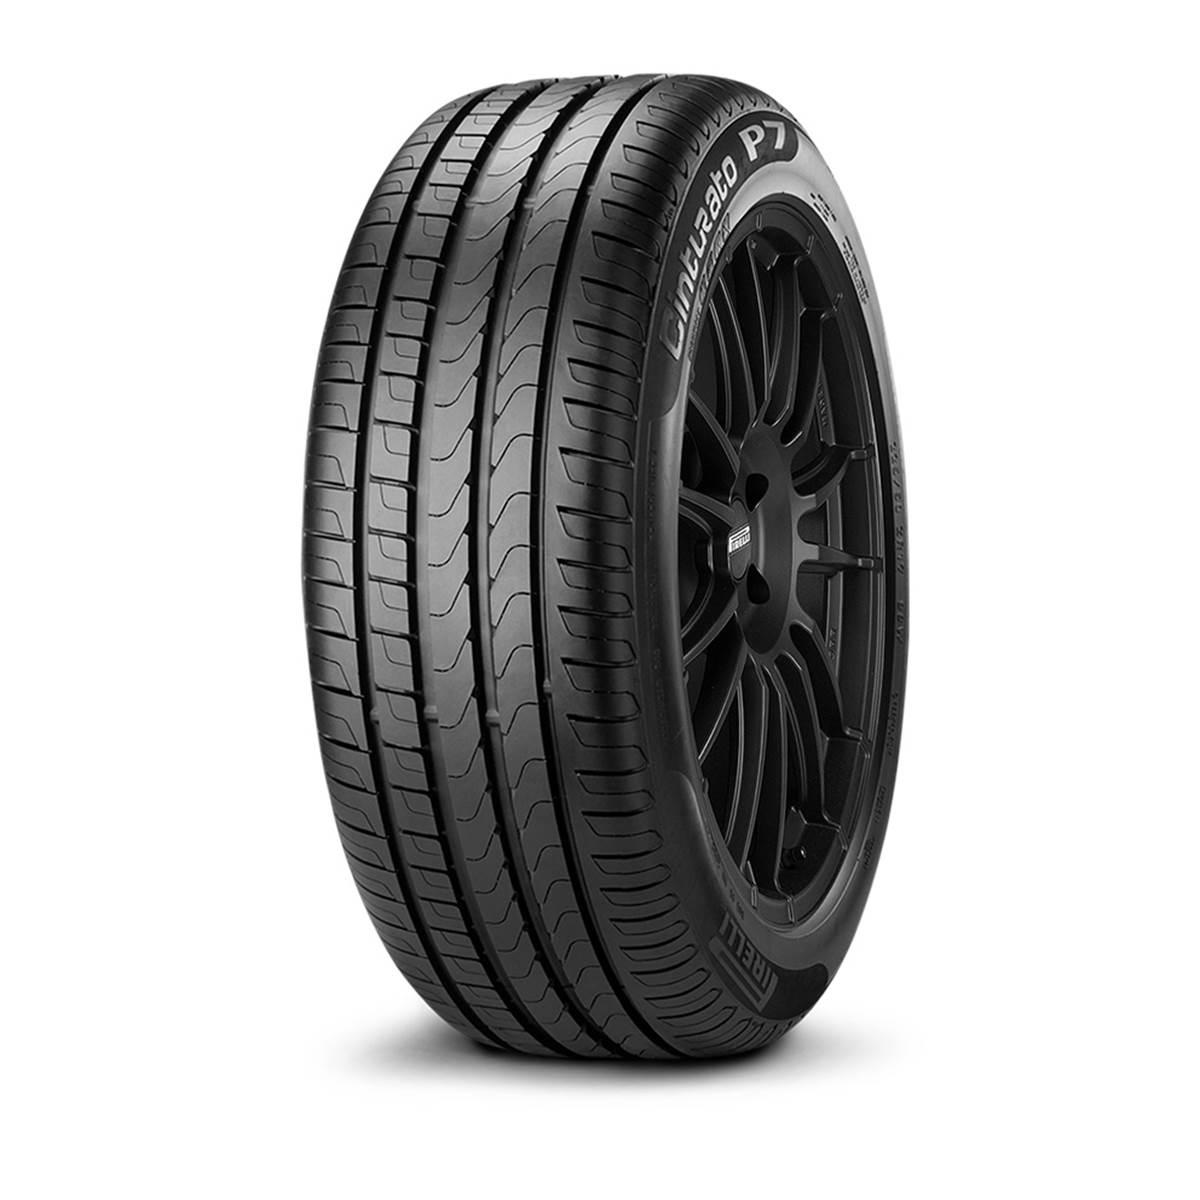 Pneu Pirelli 205/50R17 93V Cinturato P7 XL